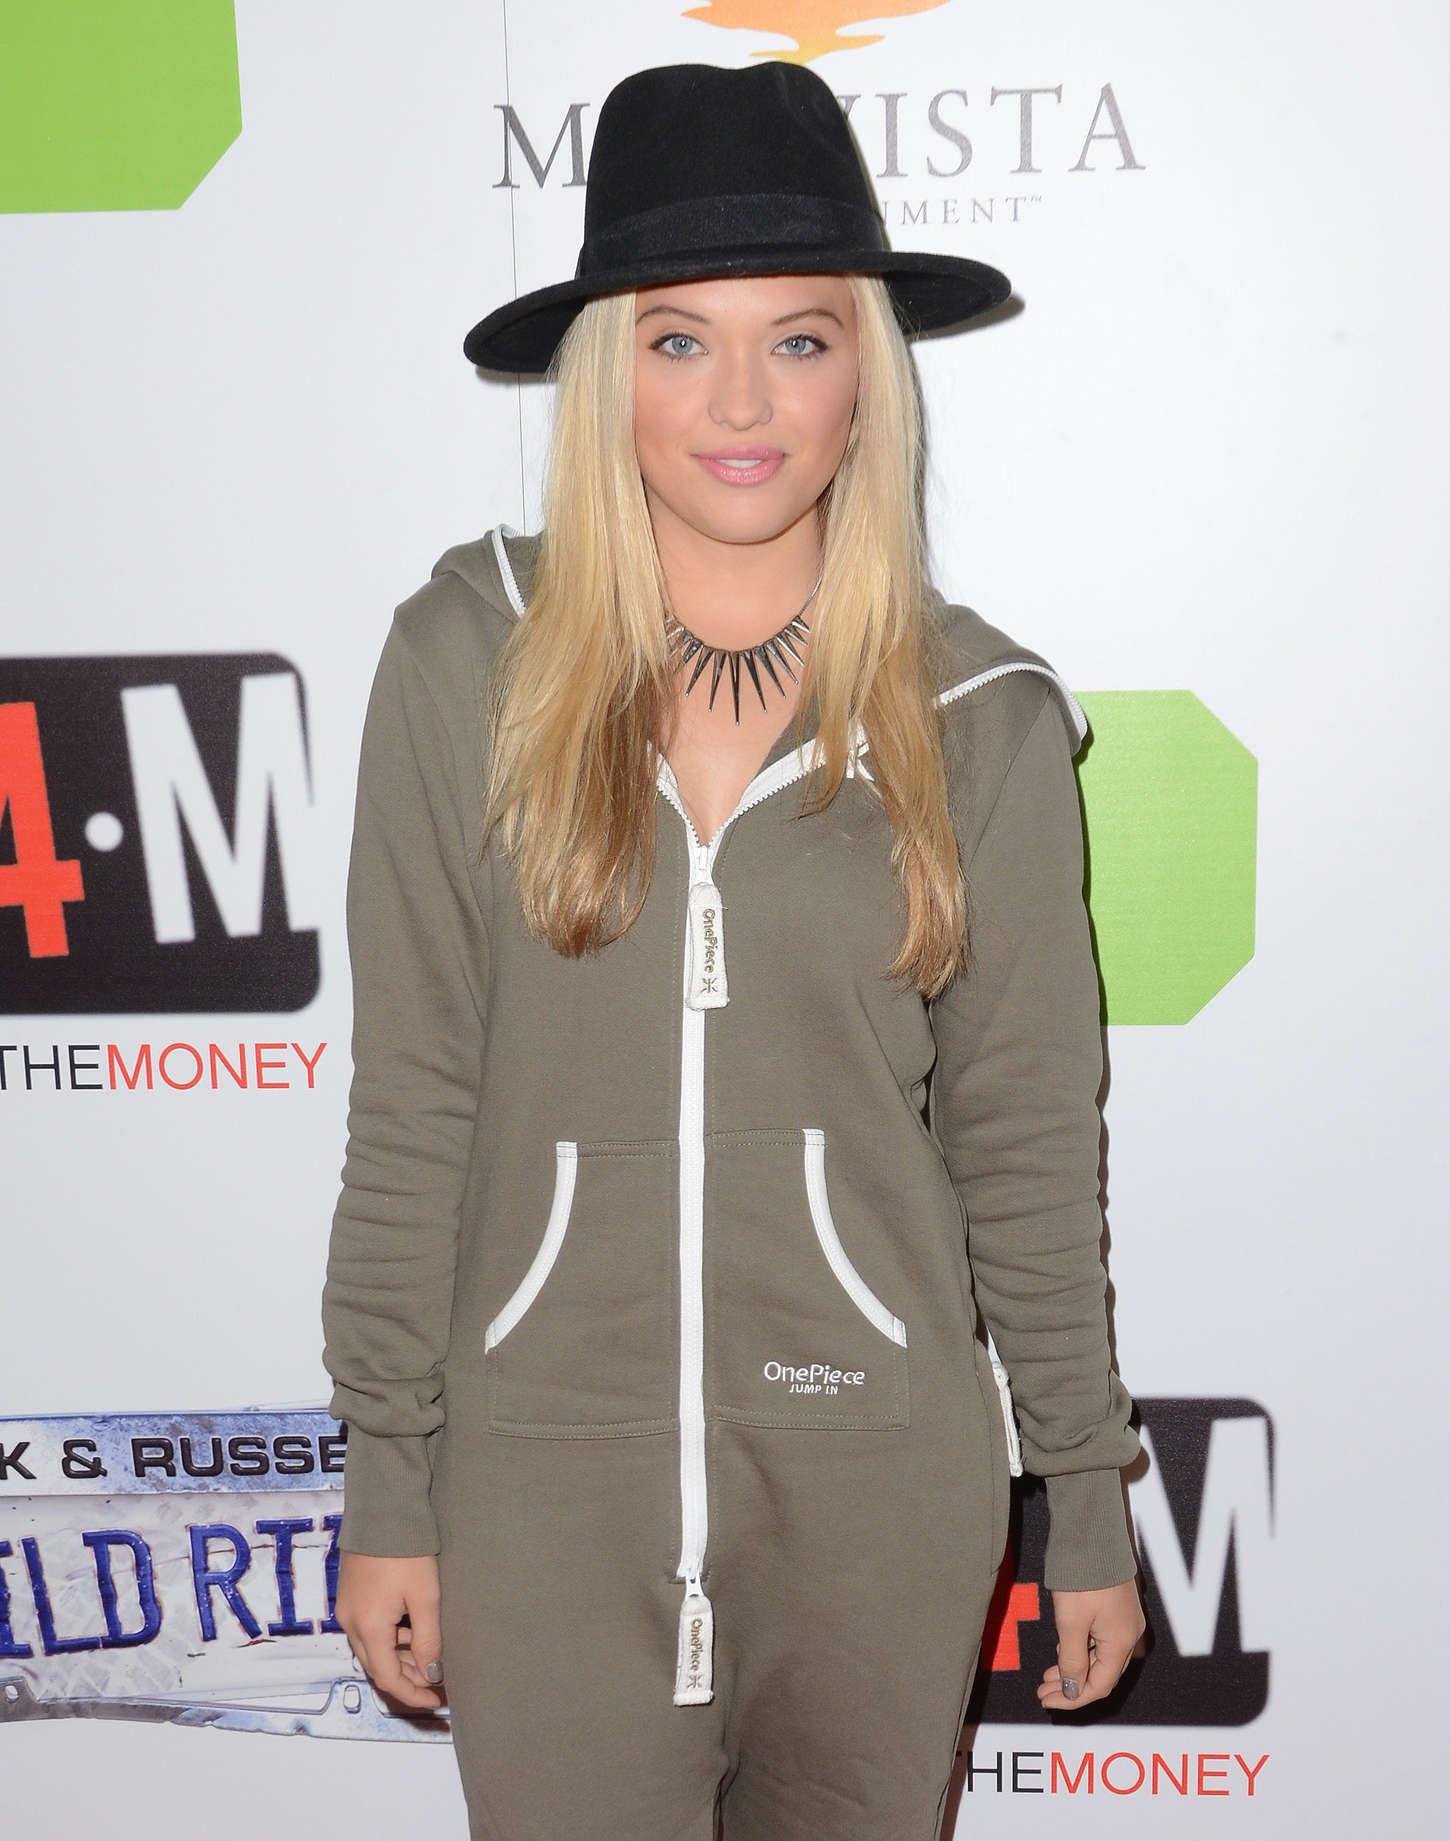 Lauren Taylor Mark Russells Wild Ride Premiere in Los Angeles